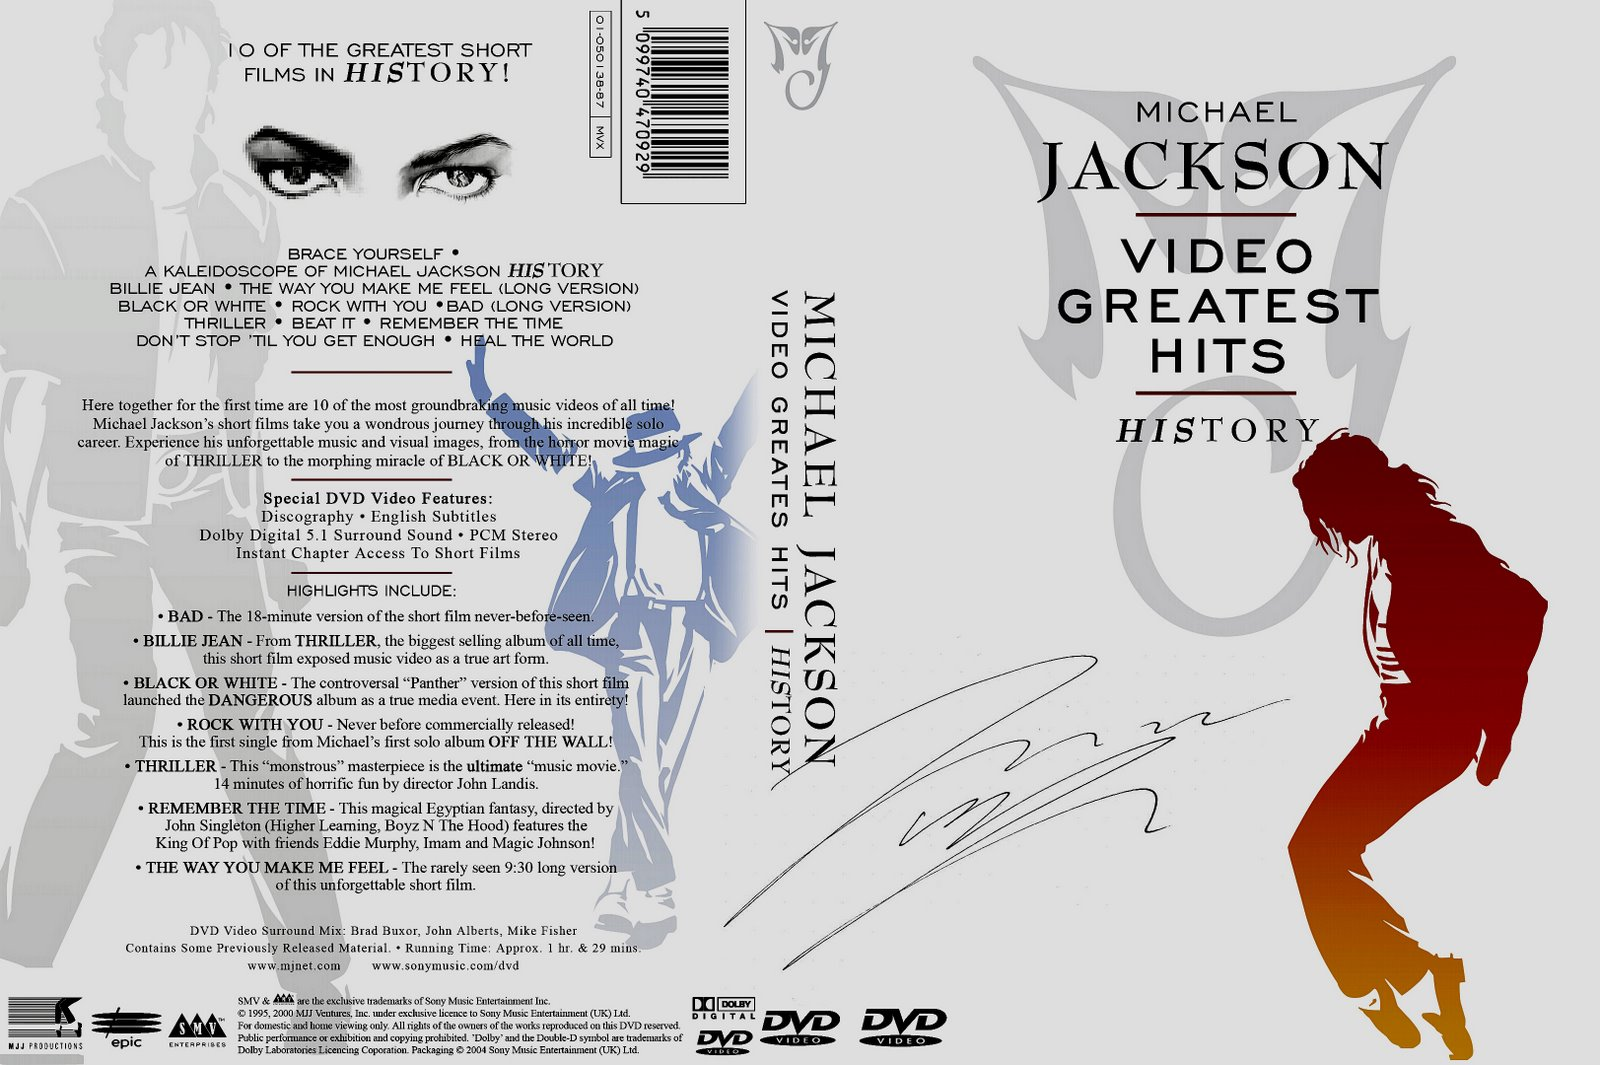 michael jackson greatest hits album mp3 download